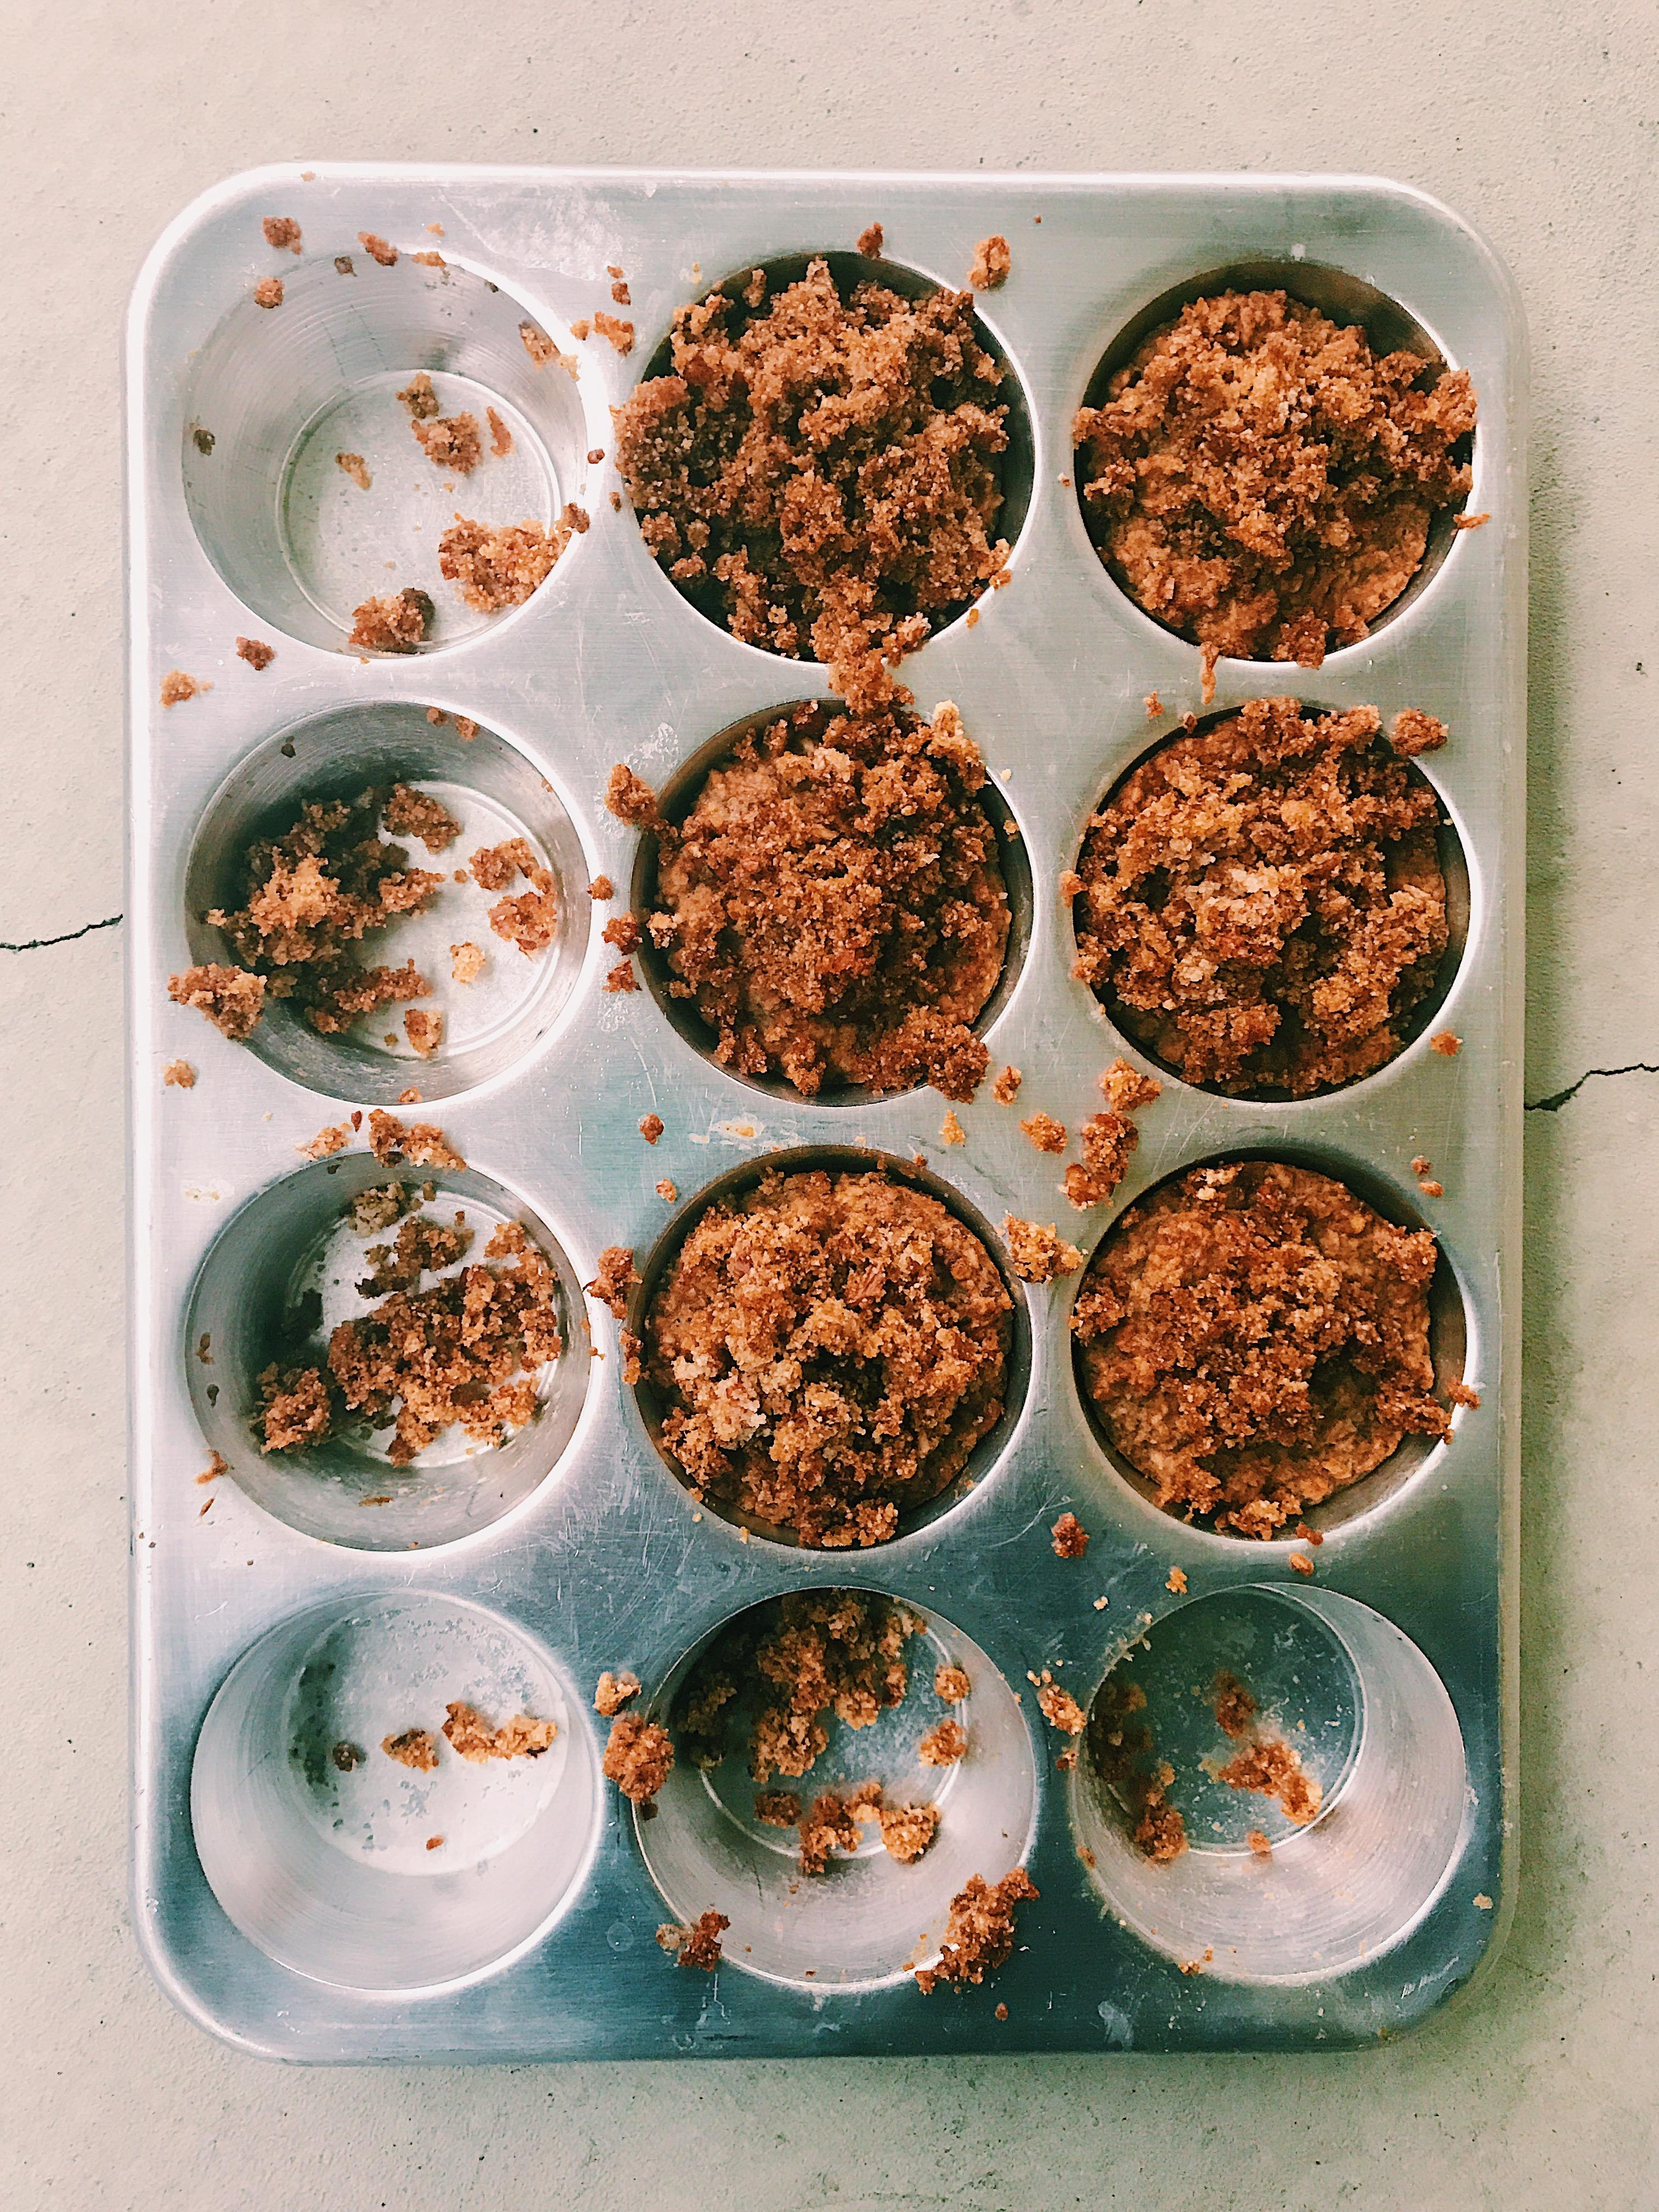 Vegan Banana Oat Flour Muffins